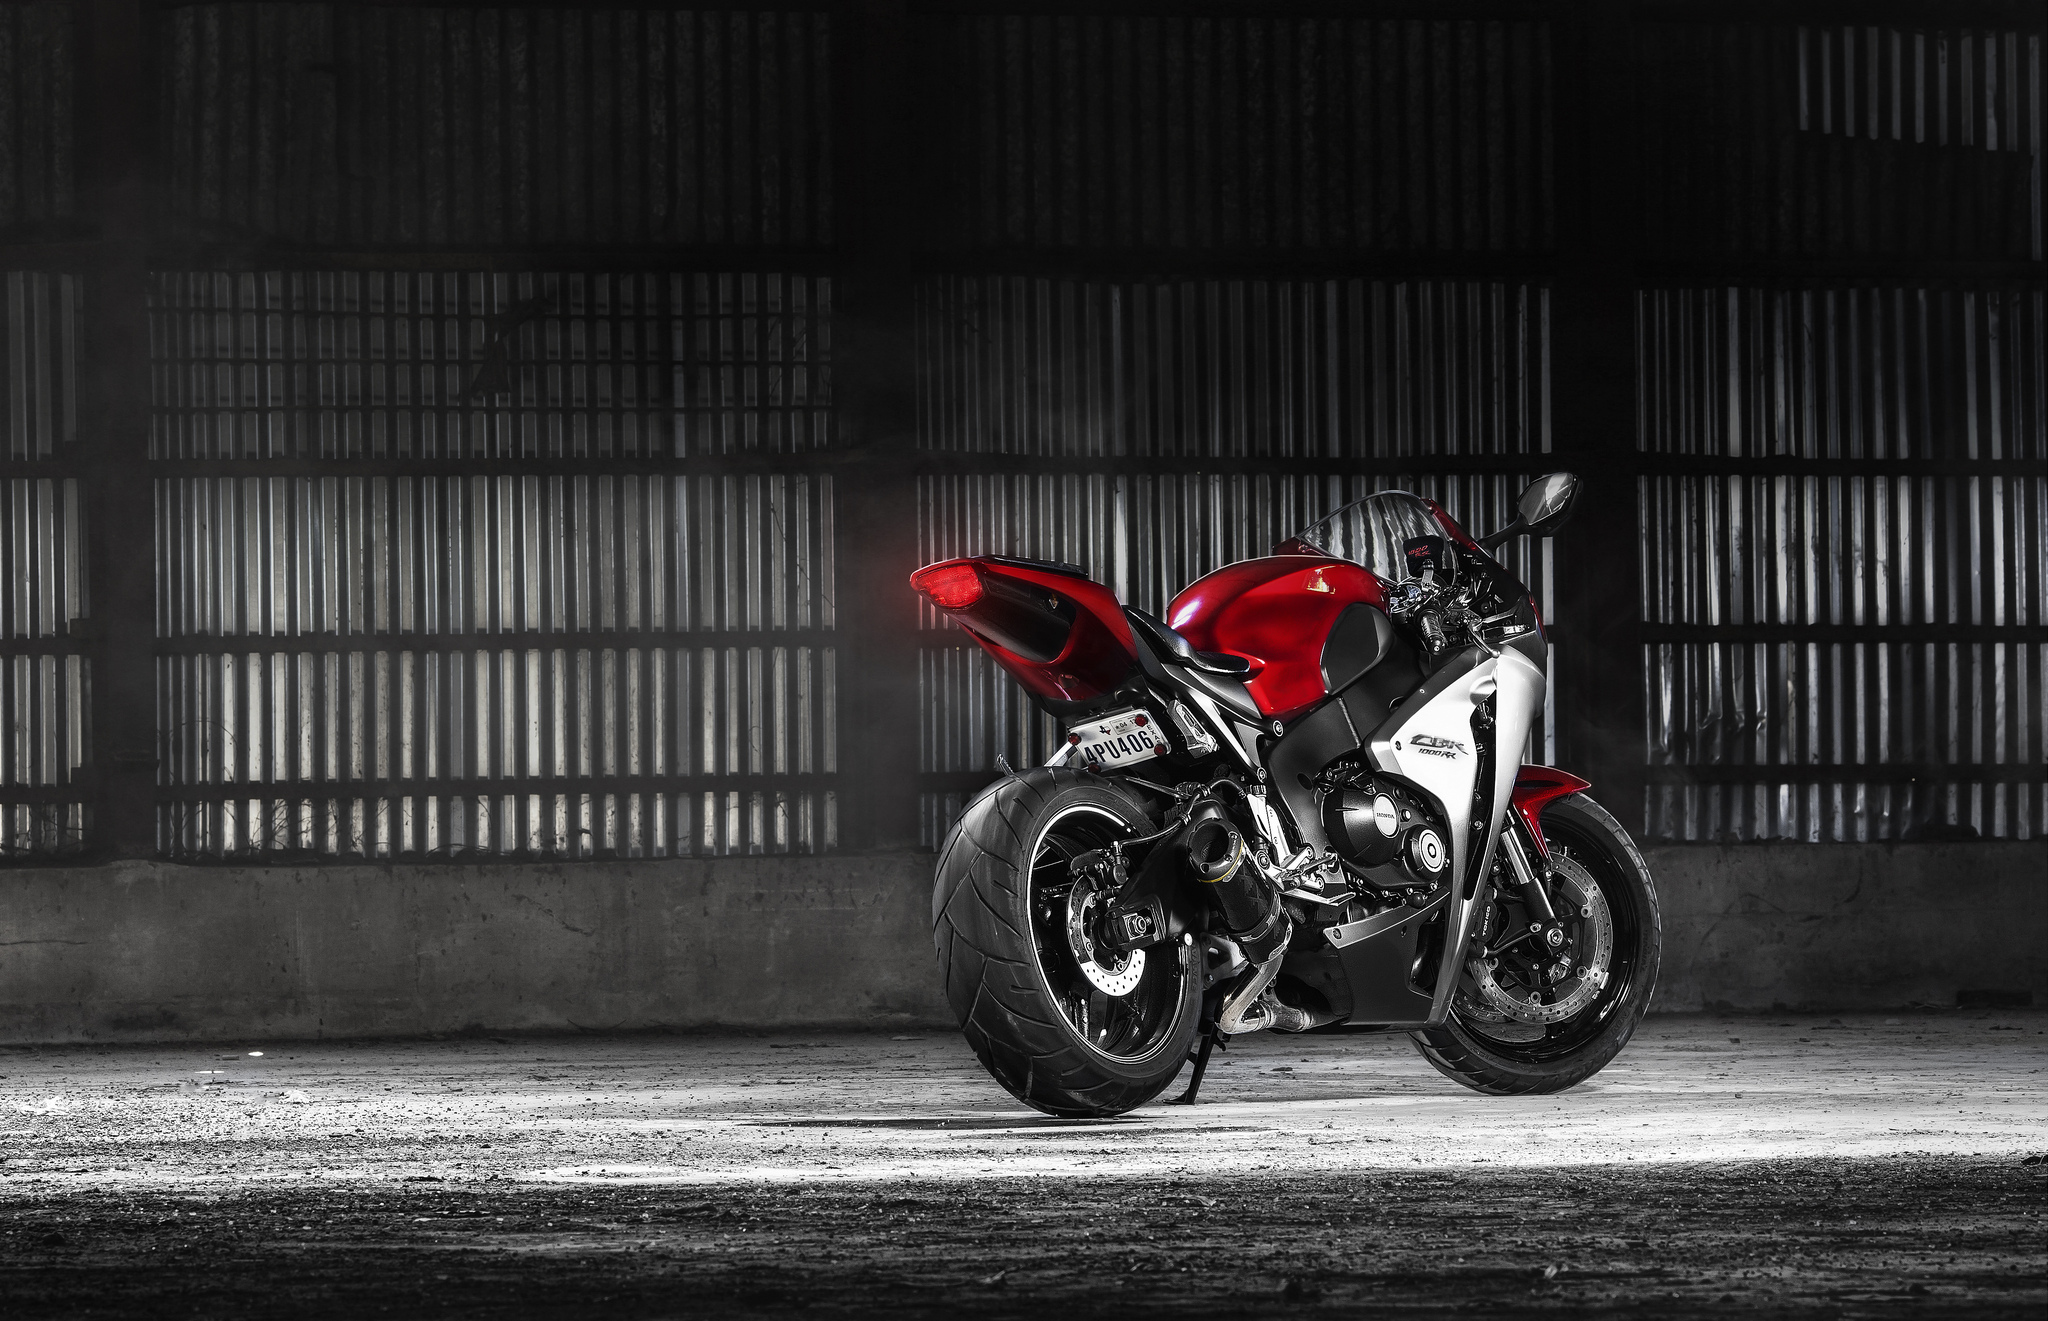 мотоциклы обои на рабочий стол фото № 596509 без смс